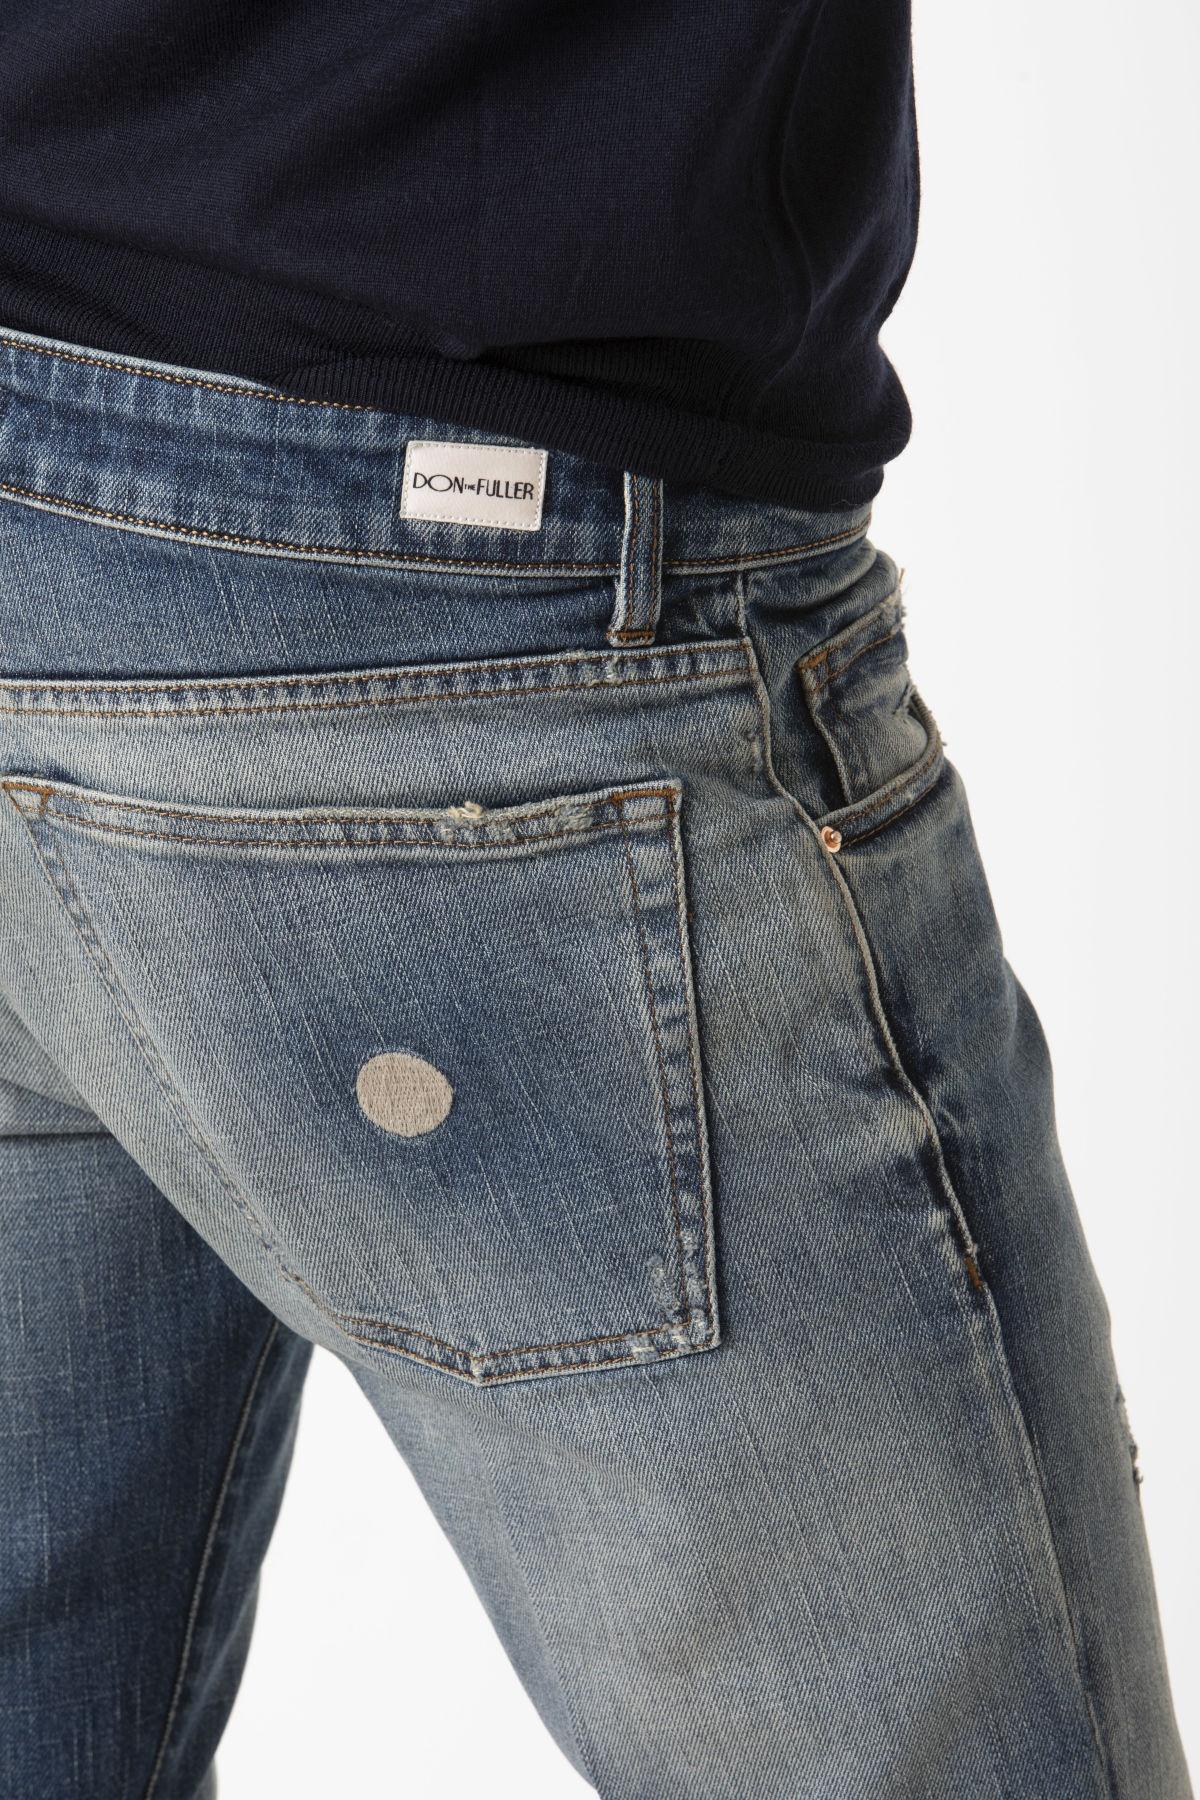 Jeans MILANO per uomo DON THE FULLER A/I 19-20